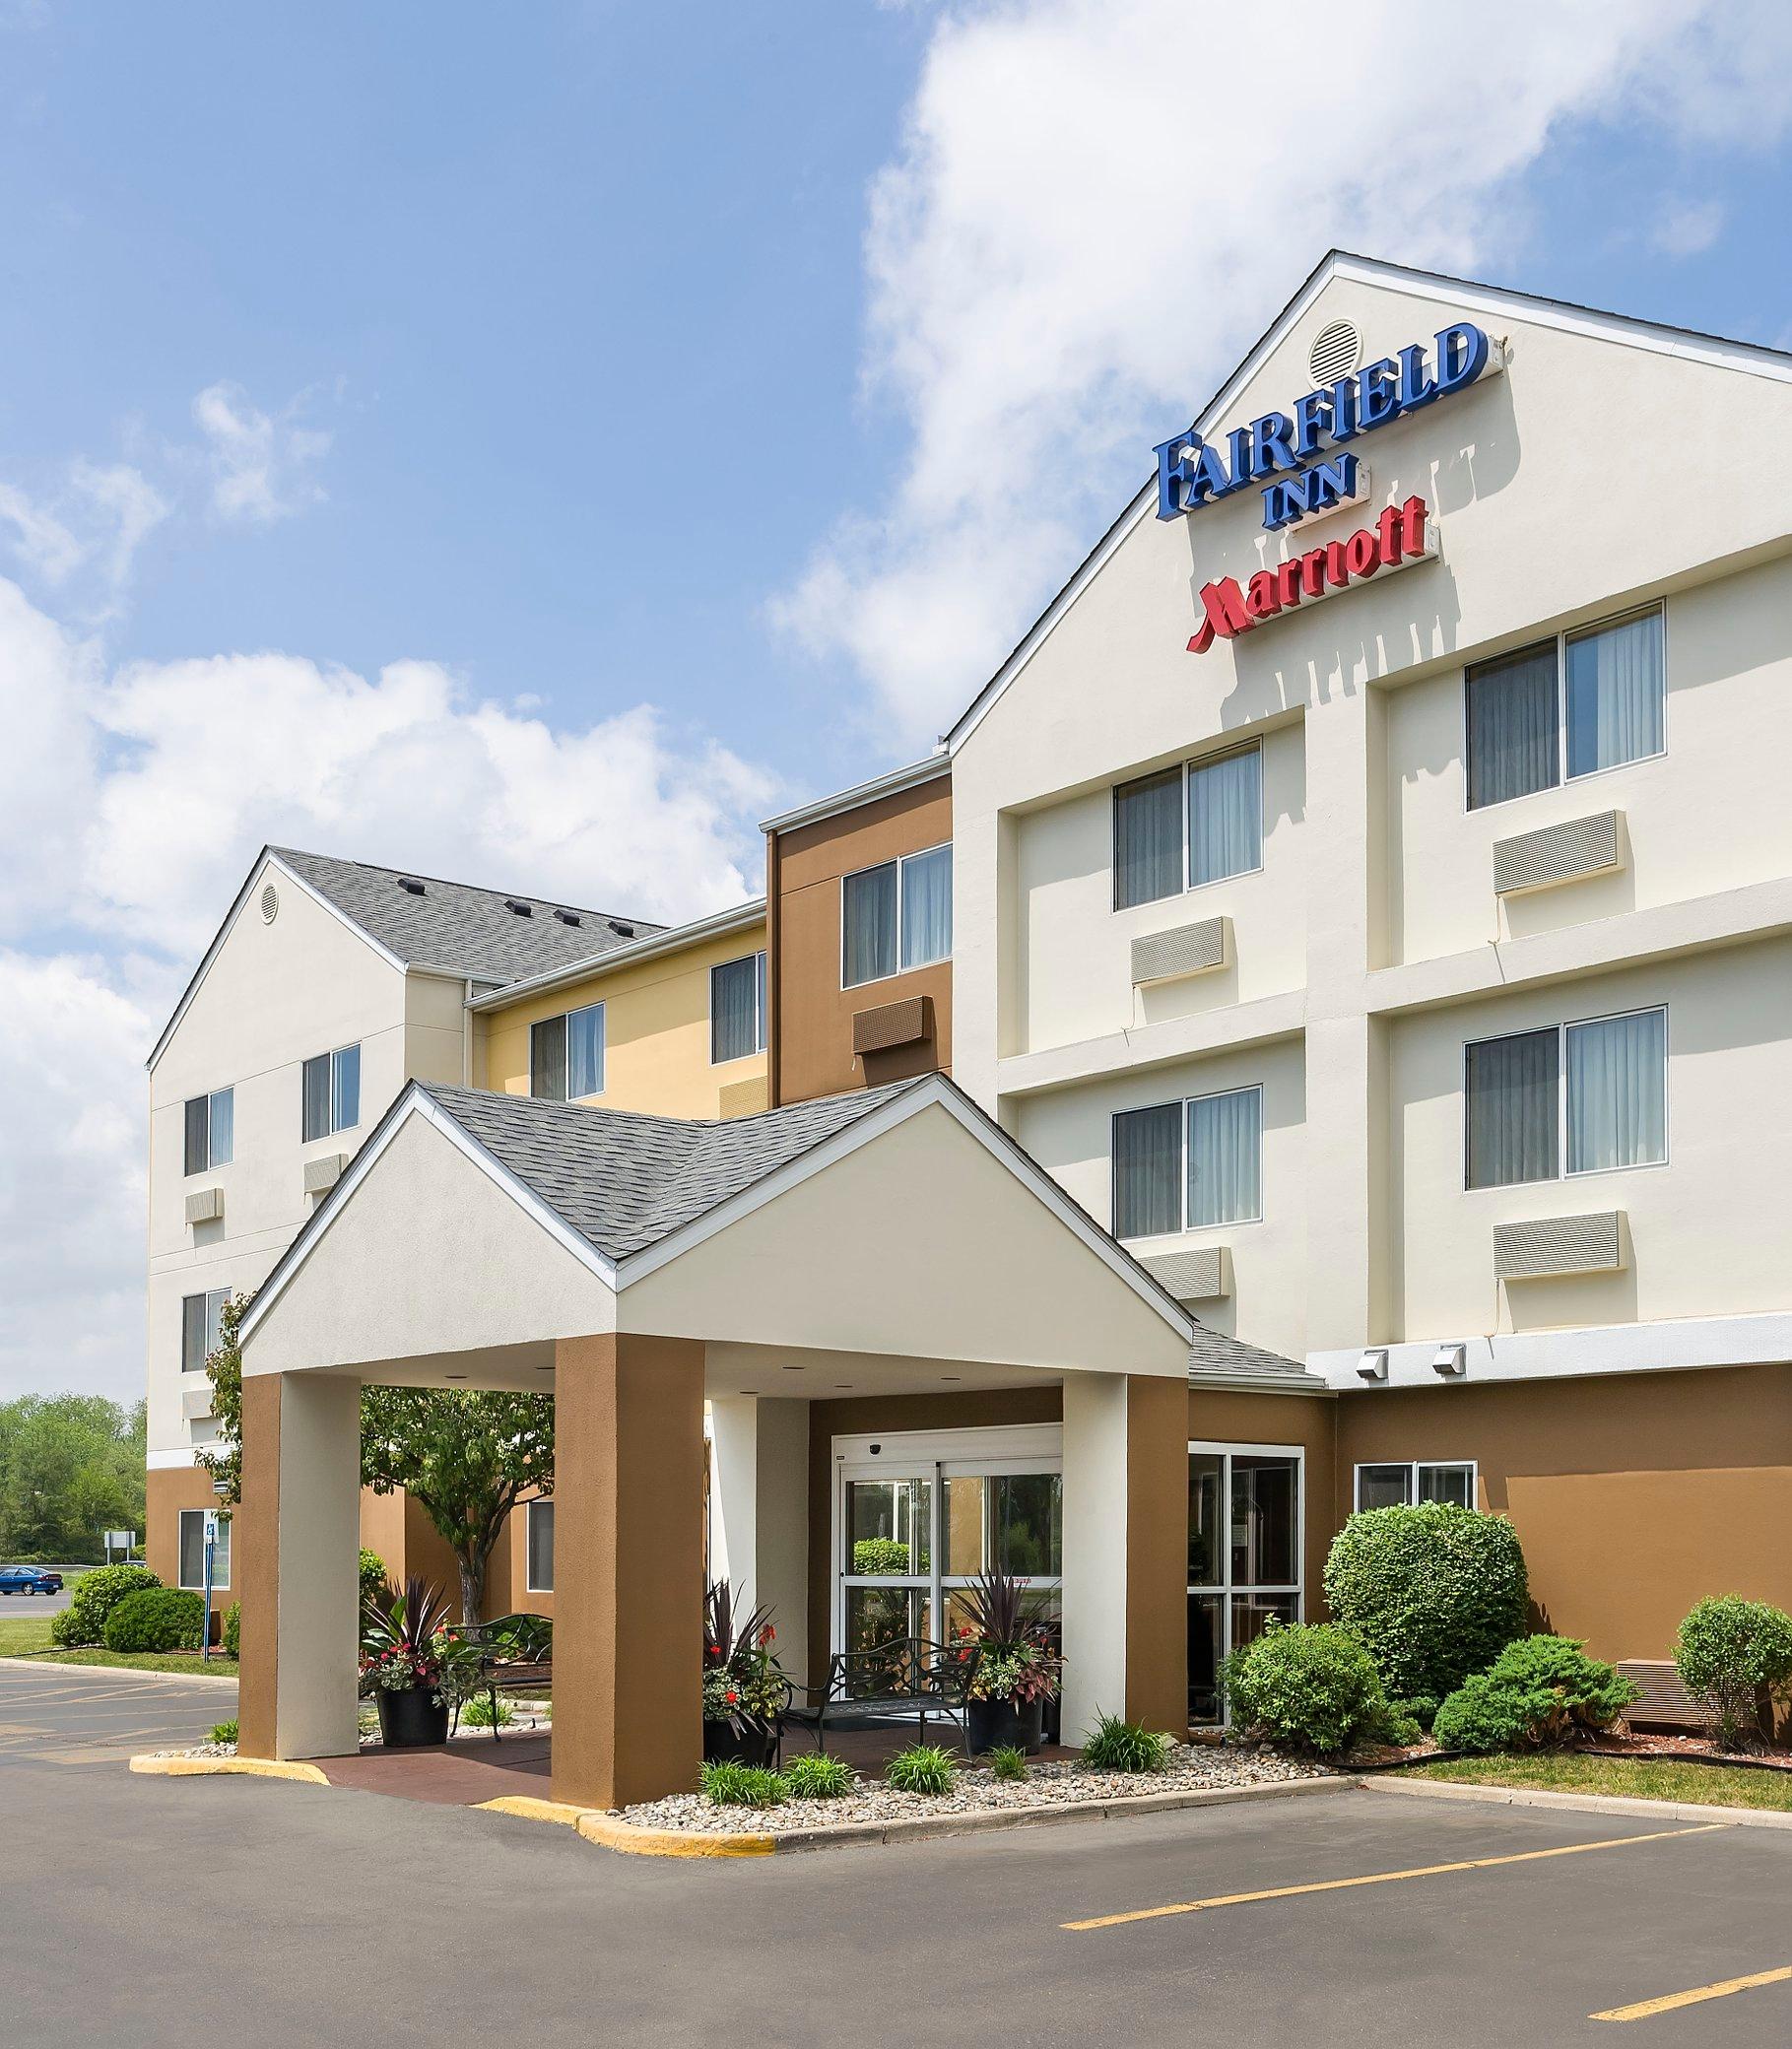 Fairfield Inn & Suites by Marriott Jackson image 11